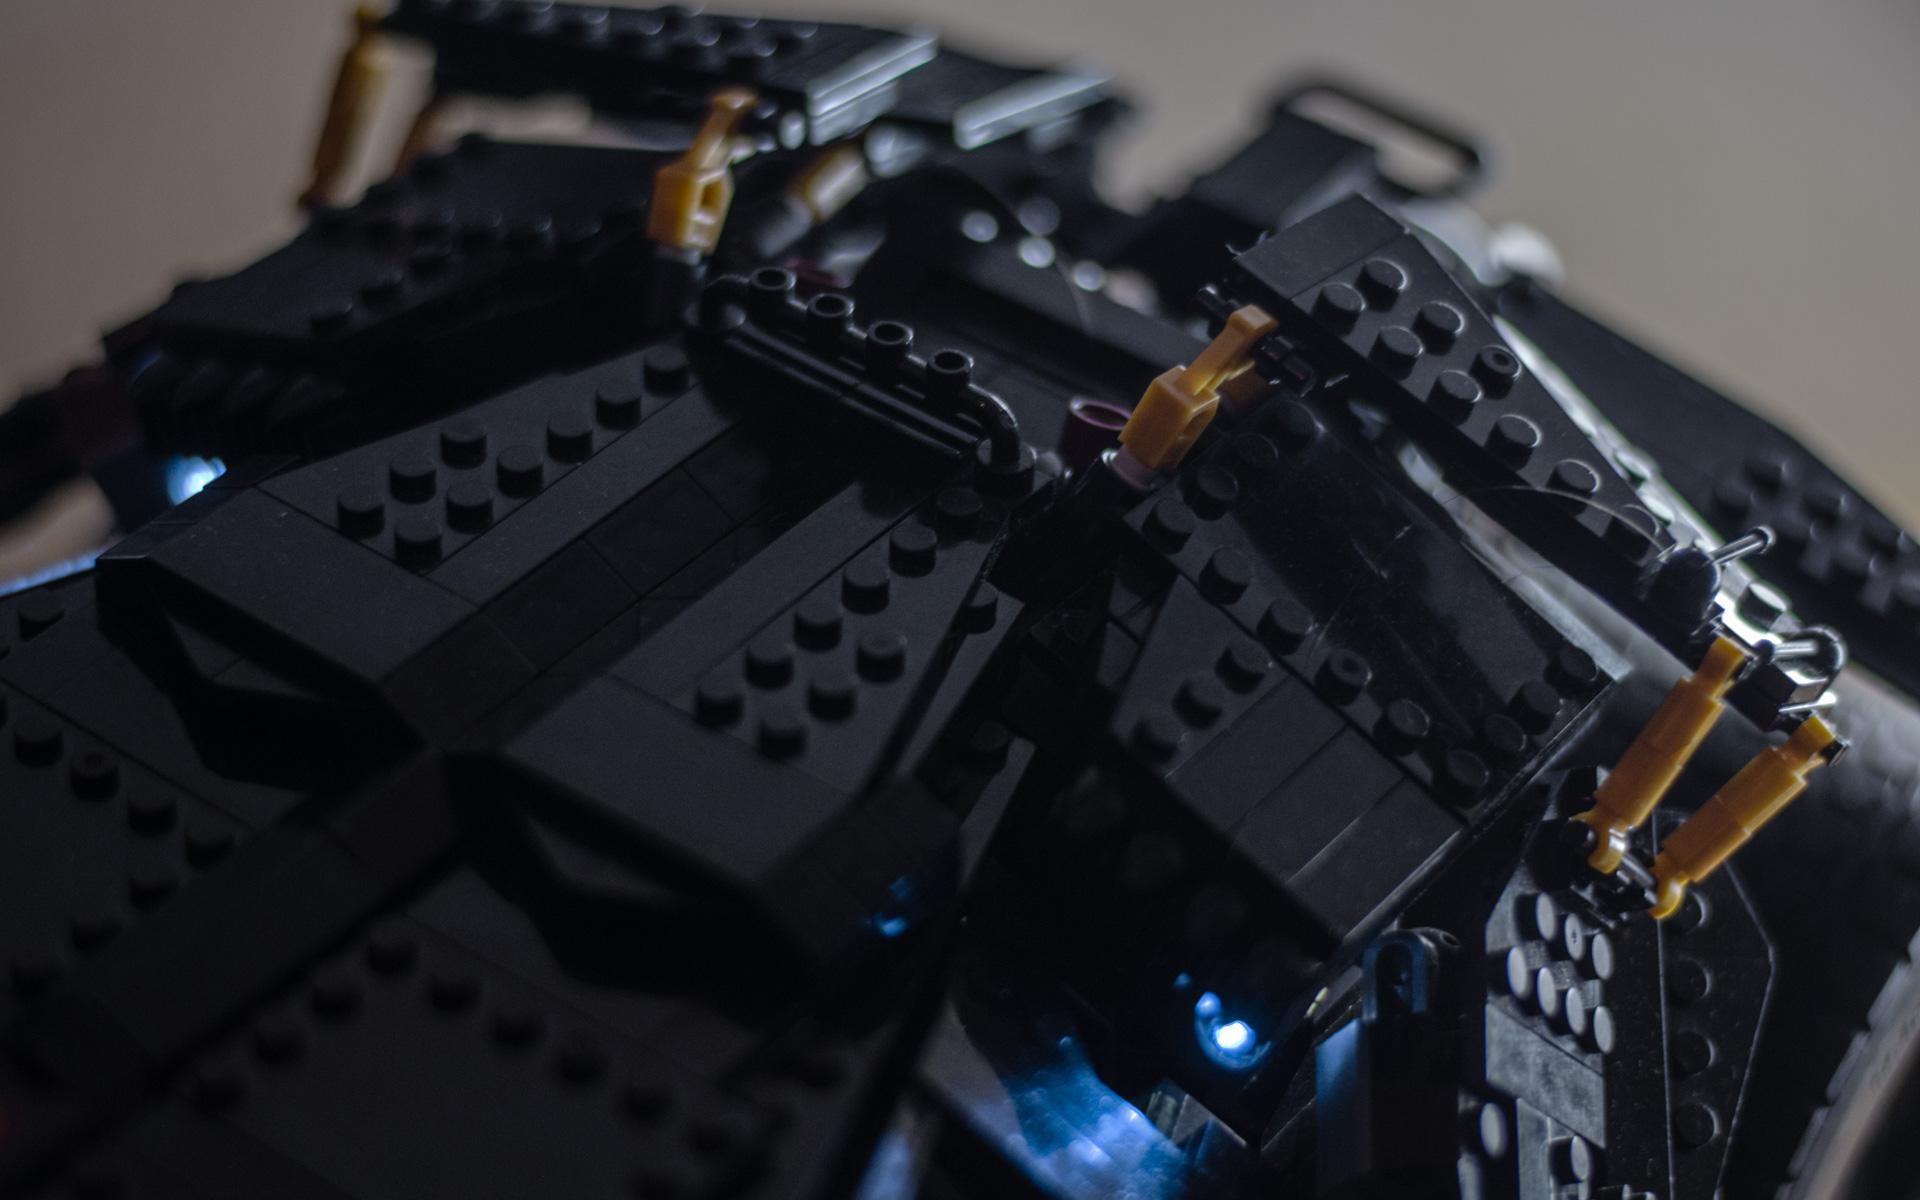 76023_lego_tumbler_motorized_power_functions_DSC_8445_1